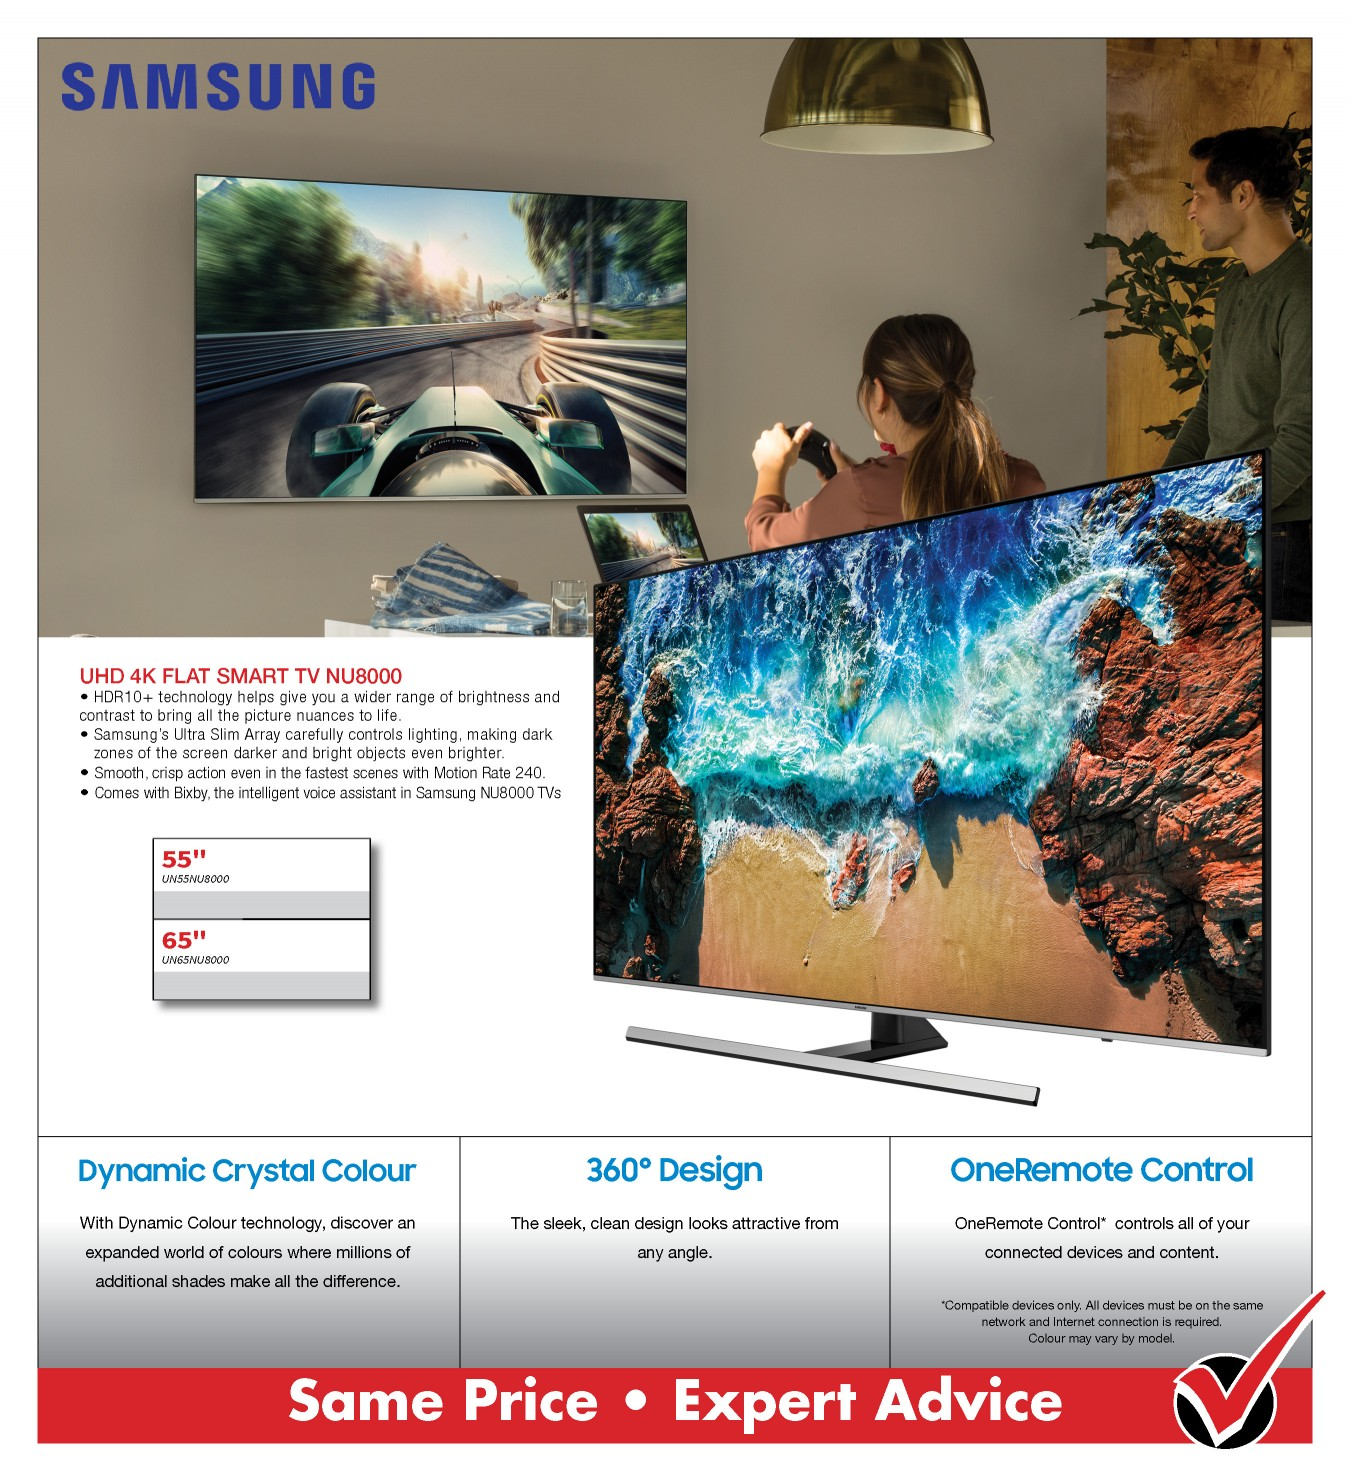 SAMSUNG NU8000 UHD TV